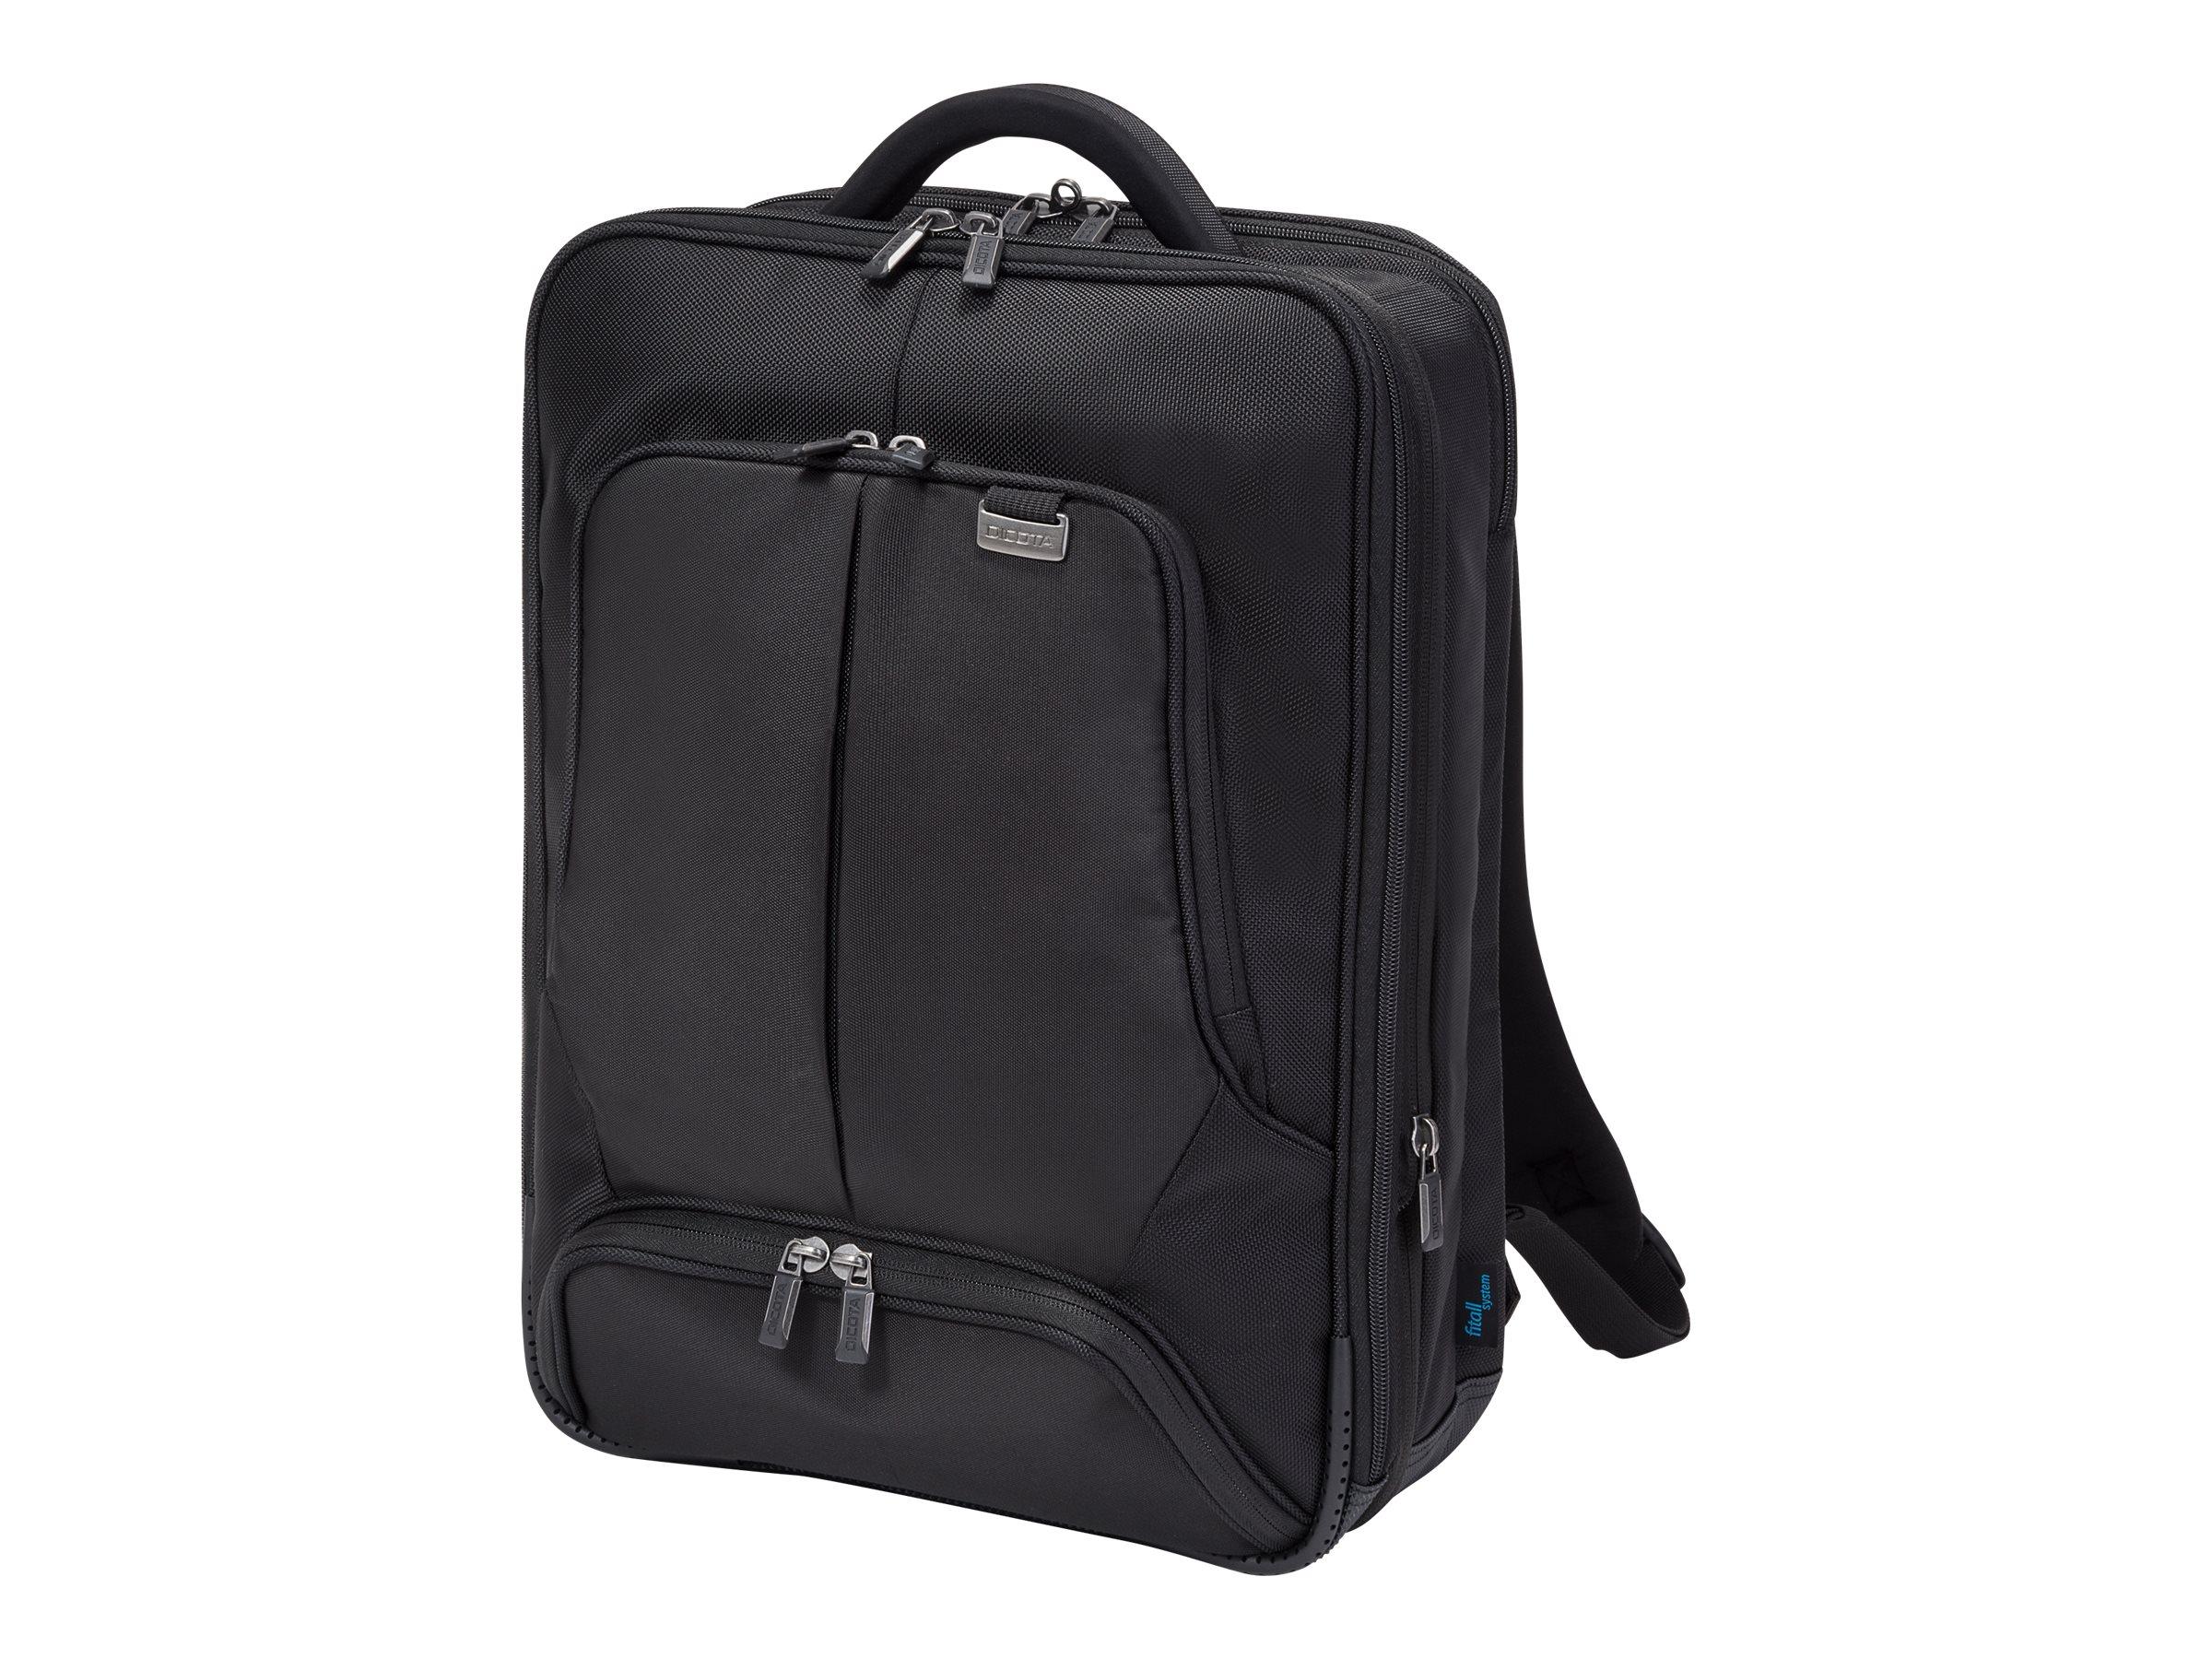 DICOTA Backpack Pro Laptop Bag 17.3